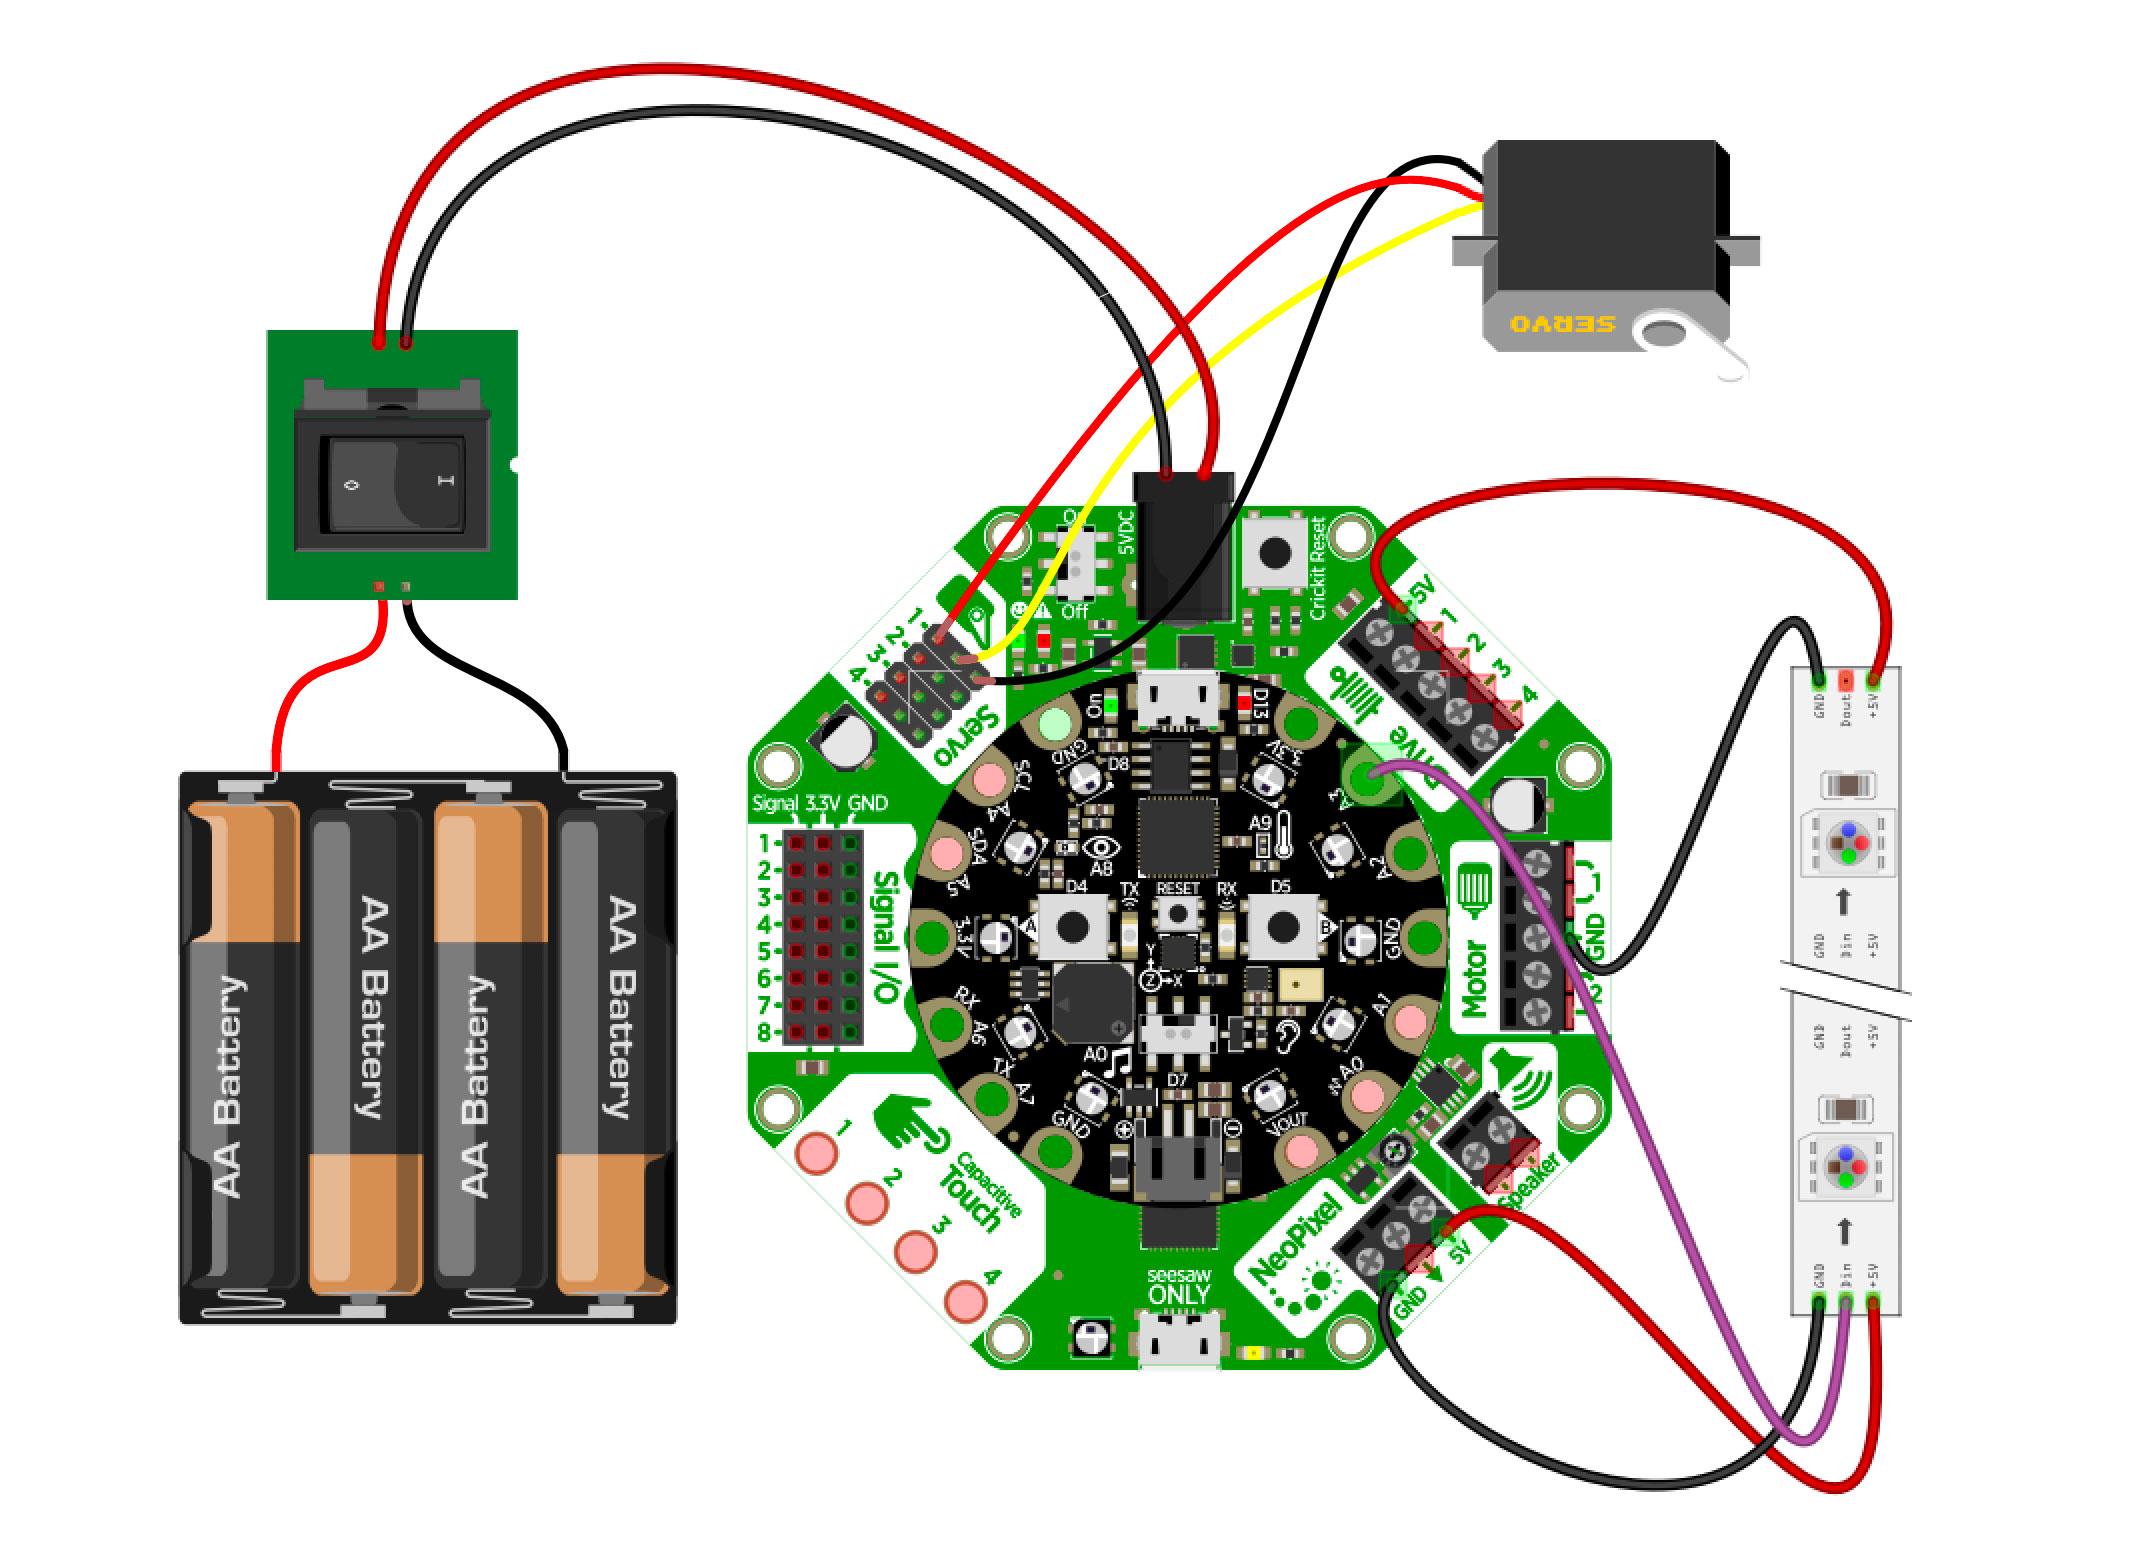 3d_printing_cricuit-diagram.jpg